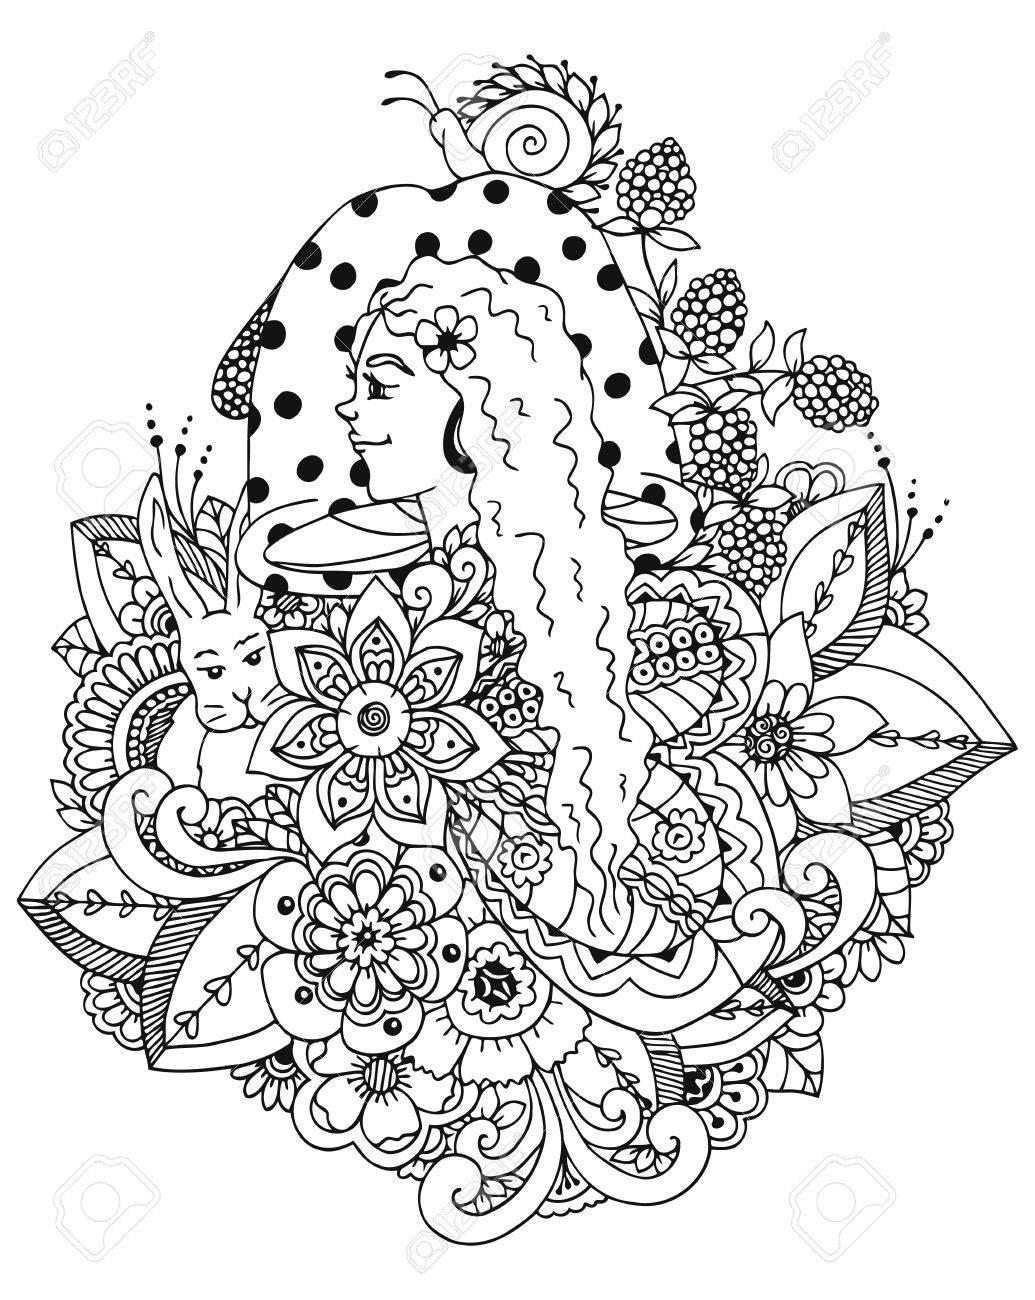 1035x1300 Vector Illustration Zentangl Girl And Mushroom In The Flowers